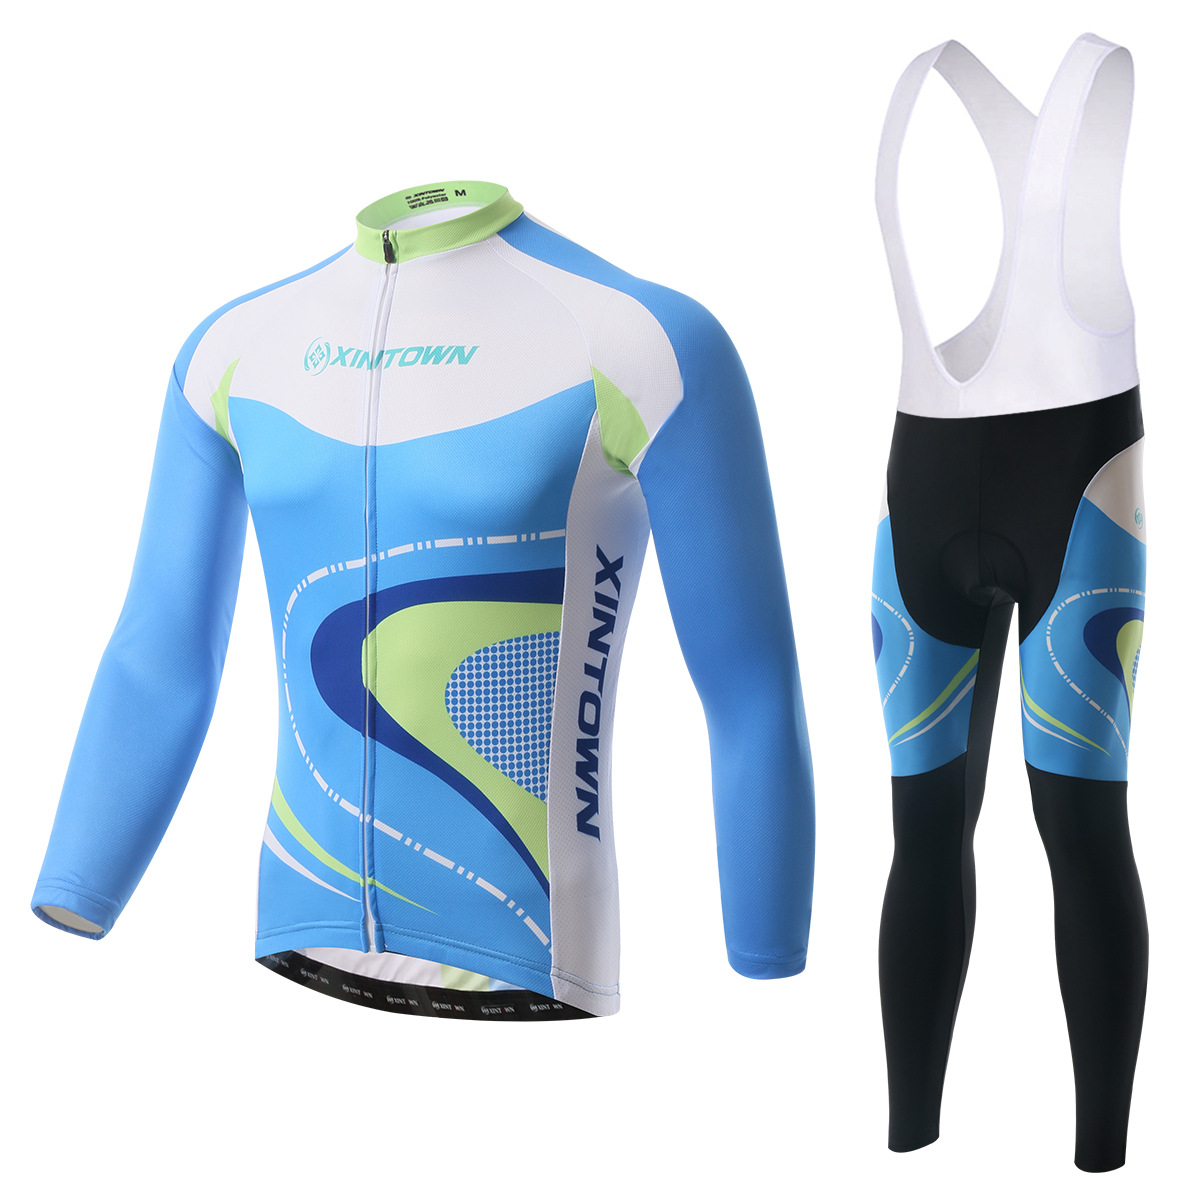 ls cycling jersey+bib pants (5)